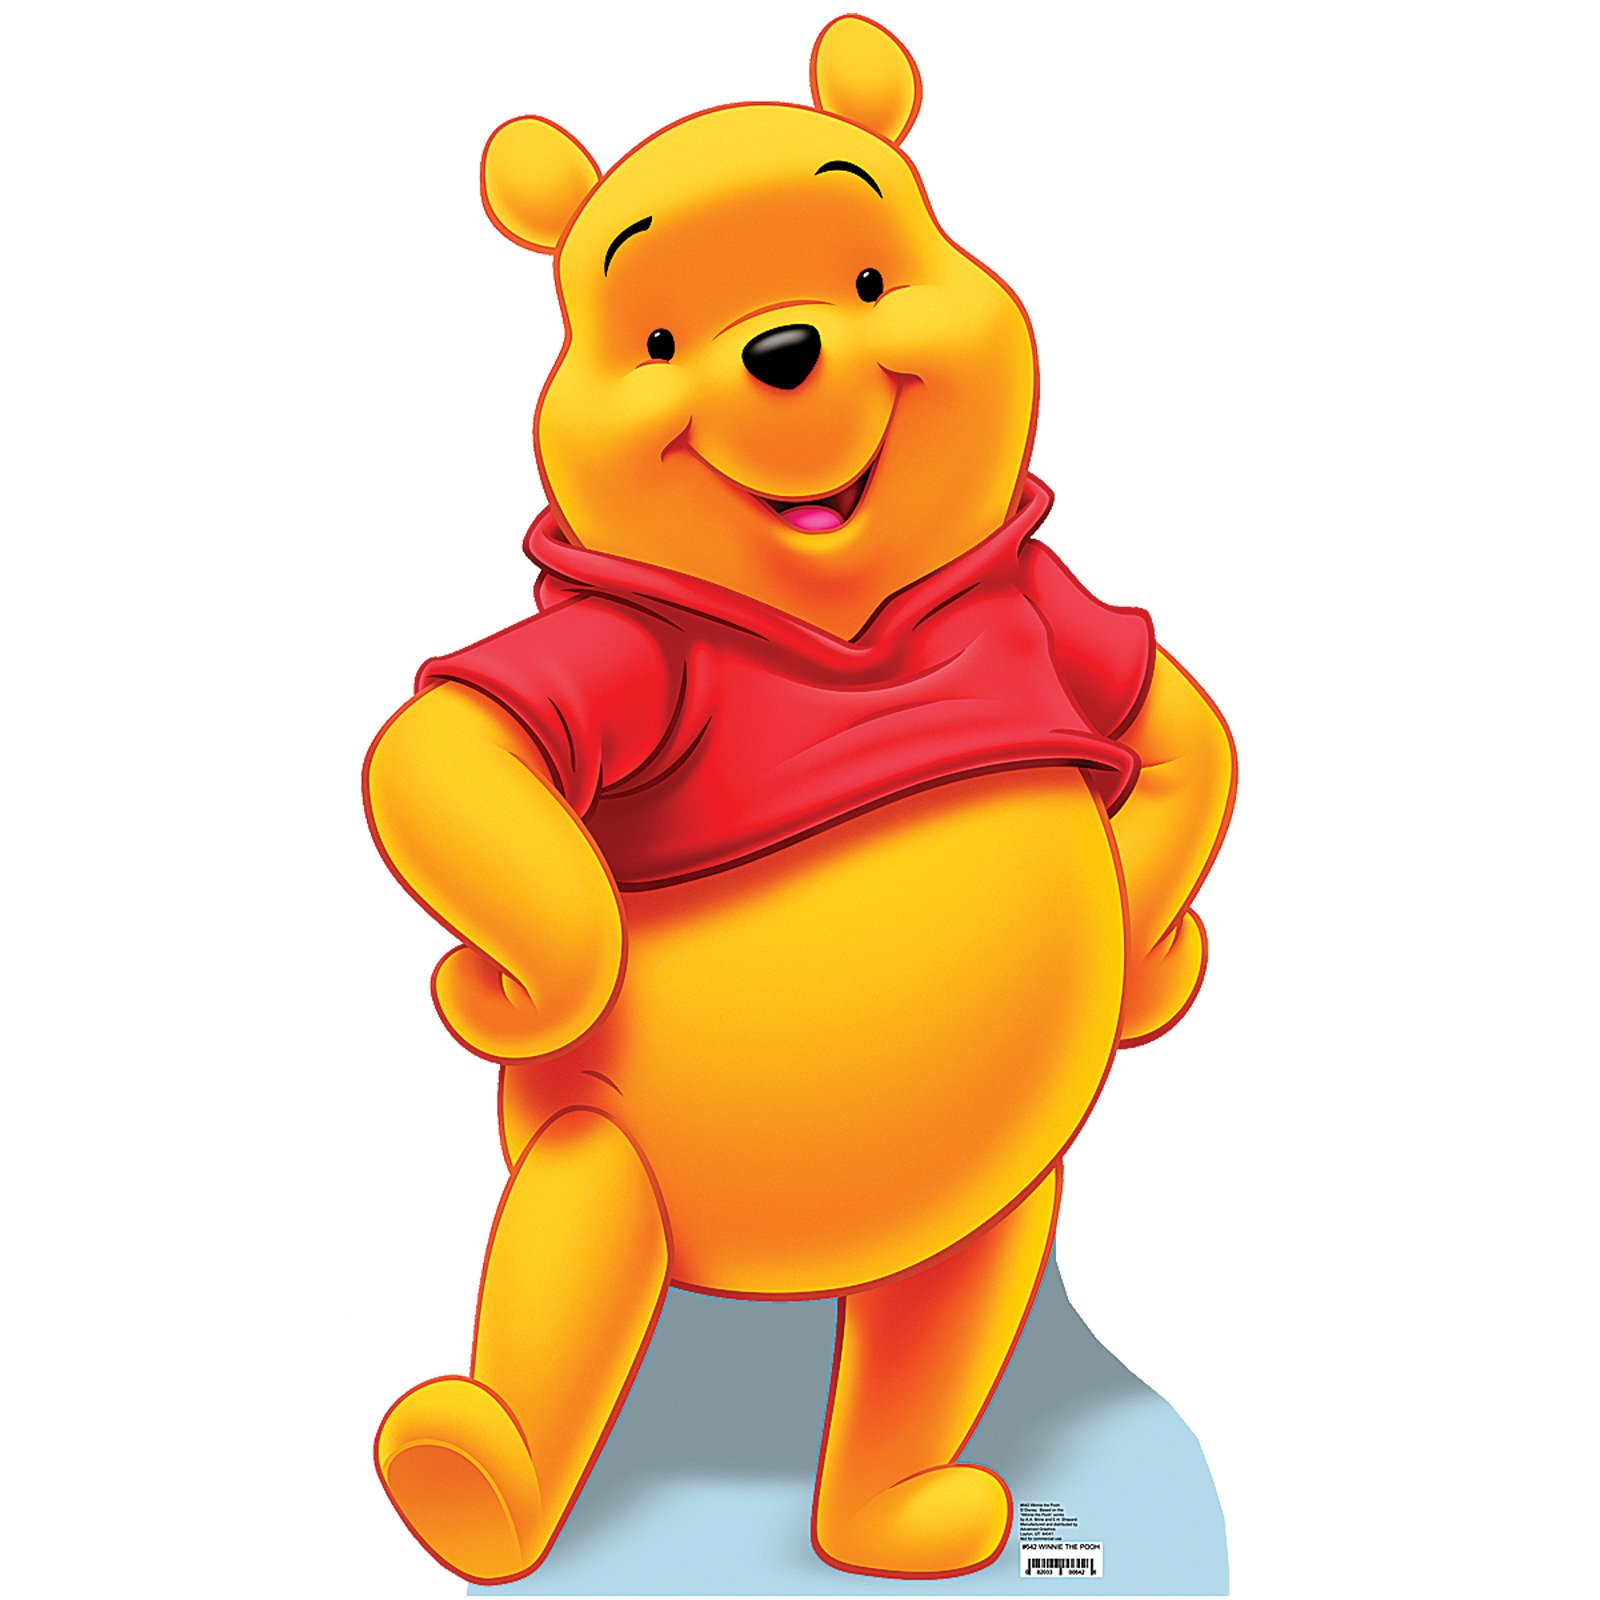 Wallpaper Winnie The Pooh: Pooh Bear Wallpaper